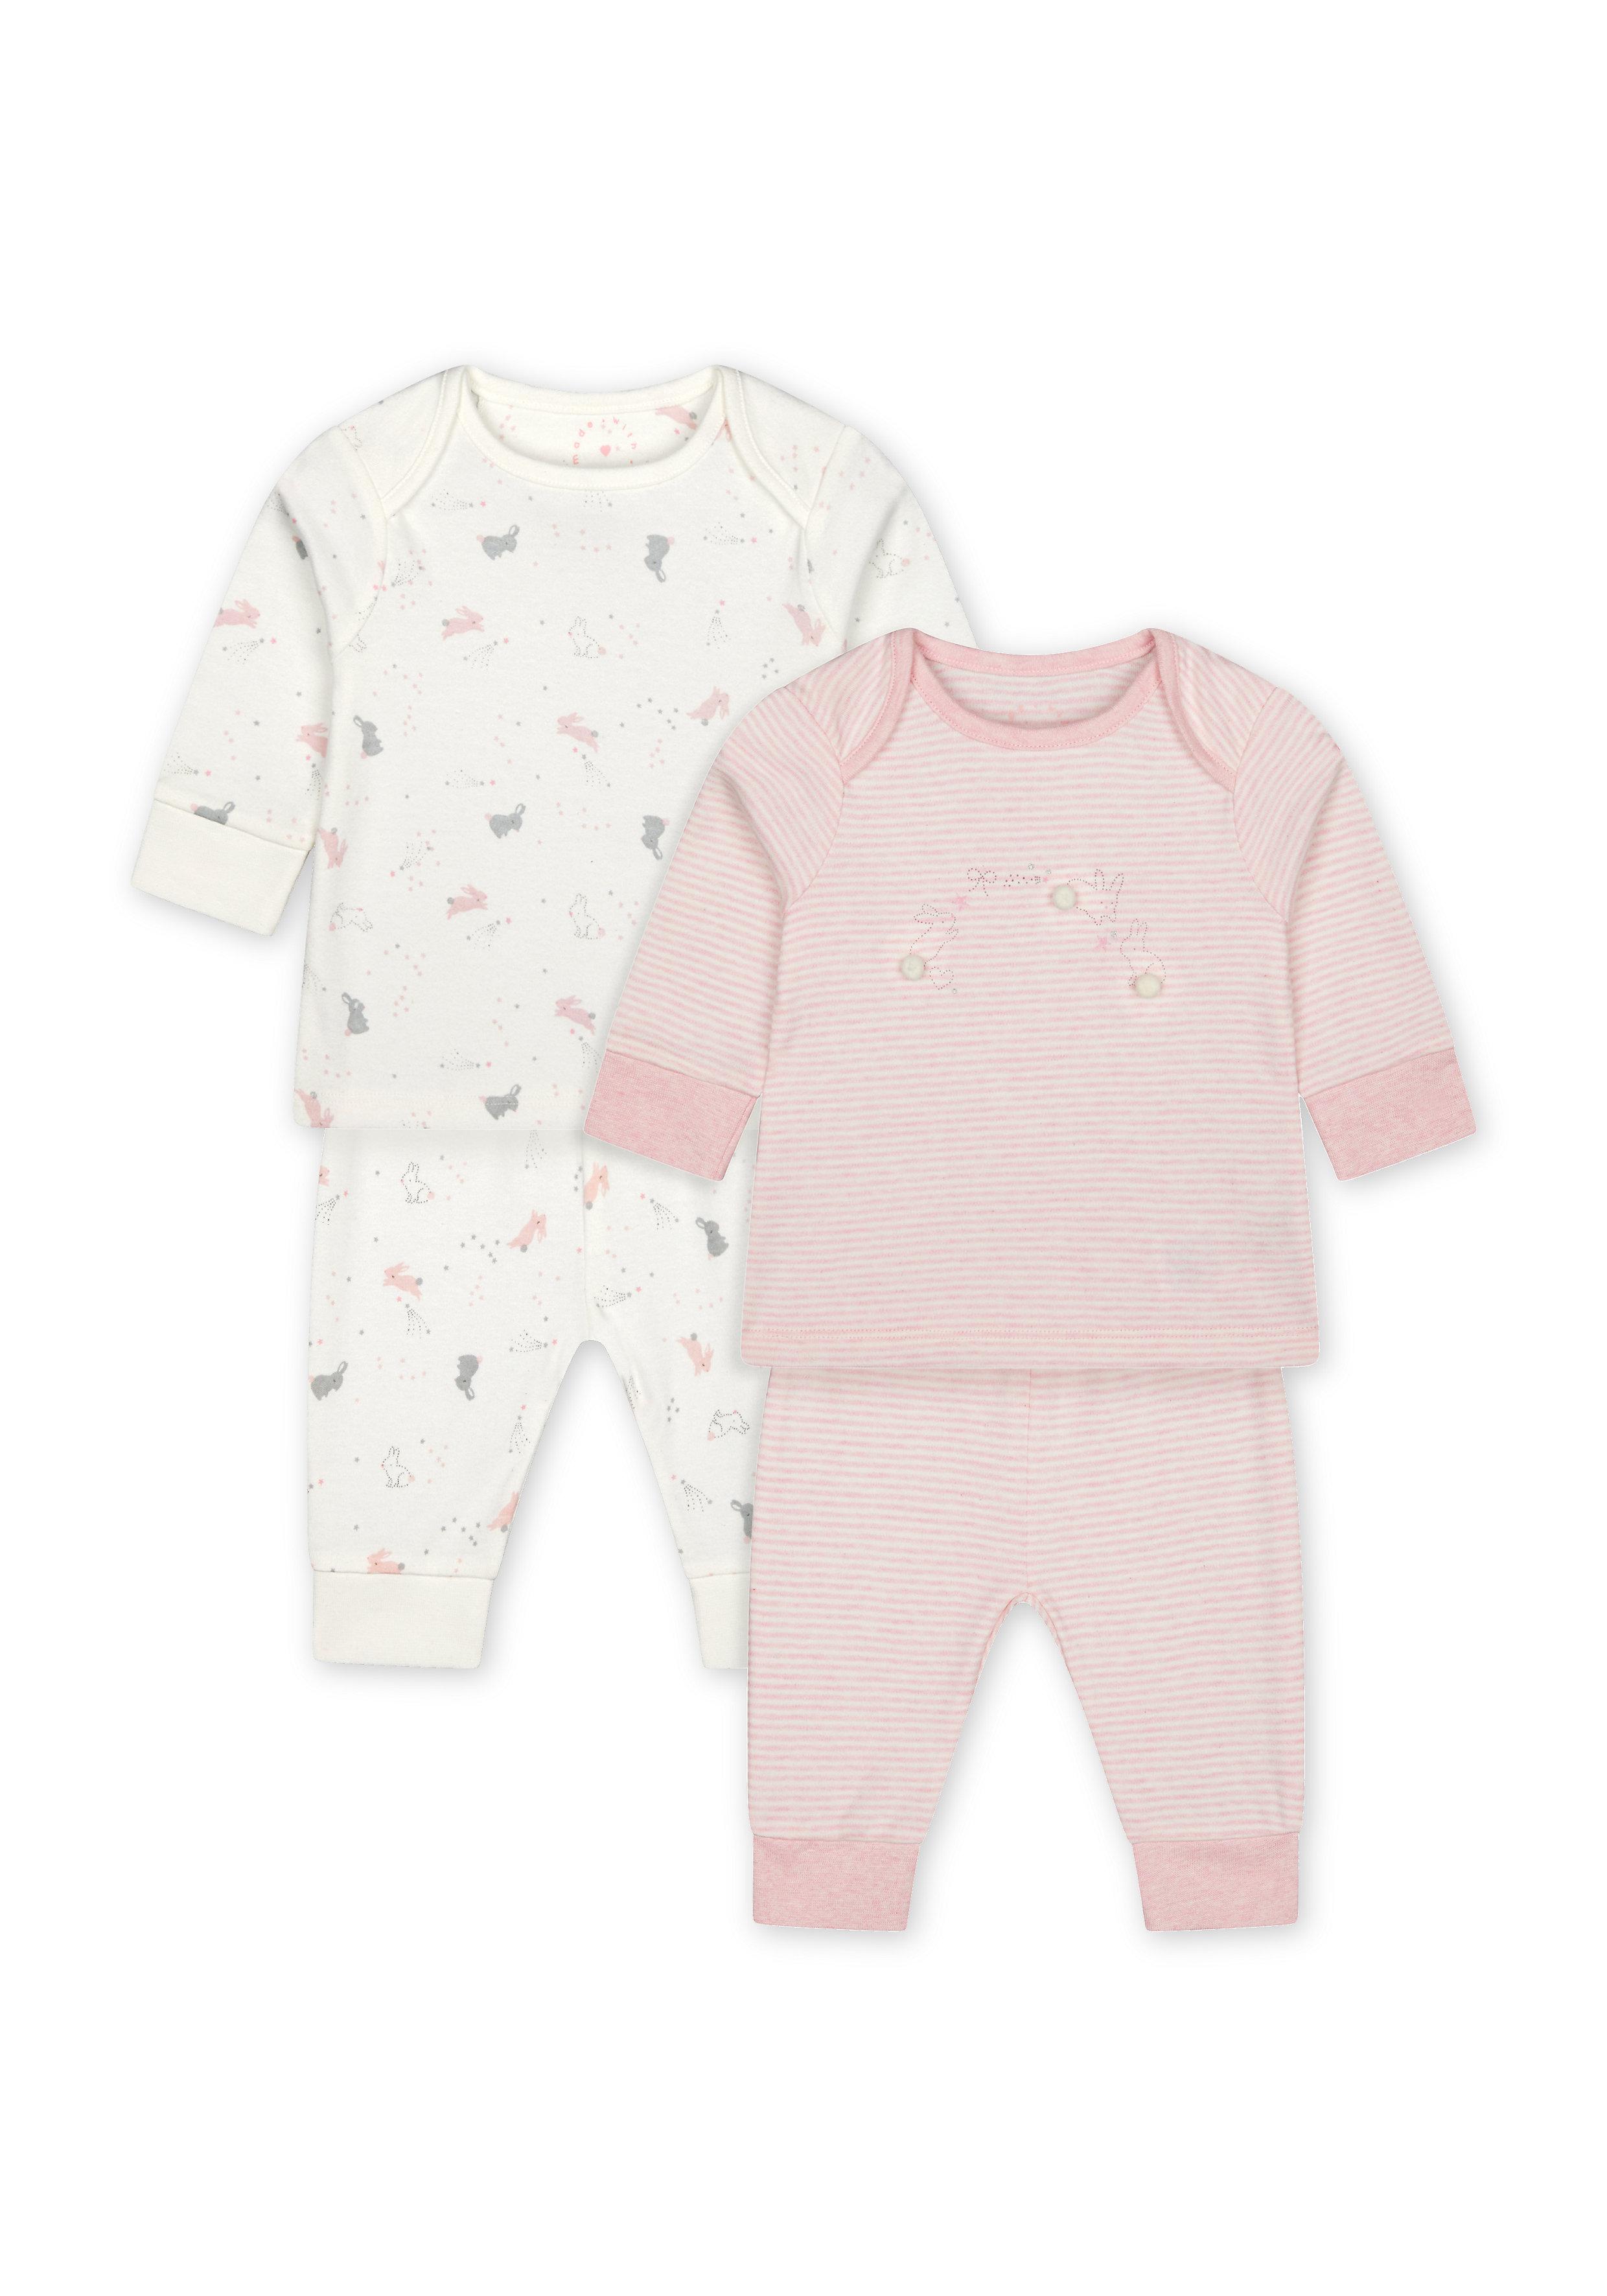 Mothercare | Girls Full Sleeves Pyjama Set Bunny Print - Pack Of 2 - Pink